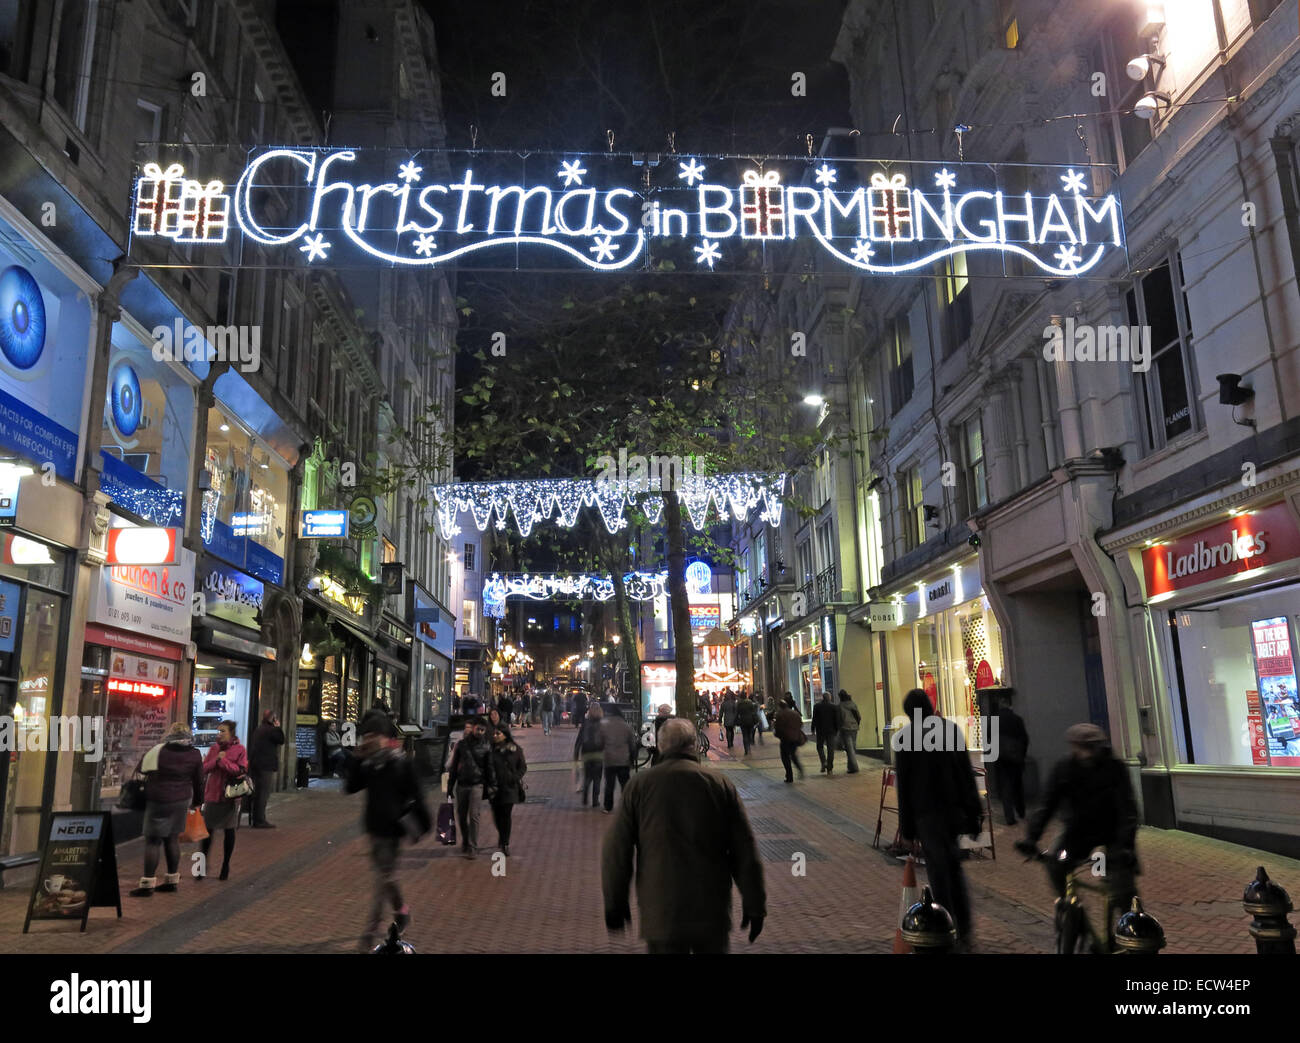 Christmas in Birmingham,Xmas,Brirmingham,shopper,shoppers,among,many,people,shopping,retail,busy,spend,spending,street,lane,st,New St,New Street,Christmas,night,dusk,winter,festival,Lights,light,decorations,in,Birmingham,West,Midlands,England,UK,United Kingdom,GB,multiracial,city,town,cities,gotonysmith,German market,German market,Frankfurt,centre,city centre,night,dusk,nighttime